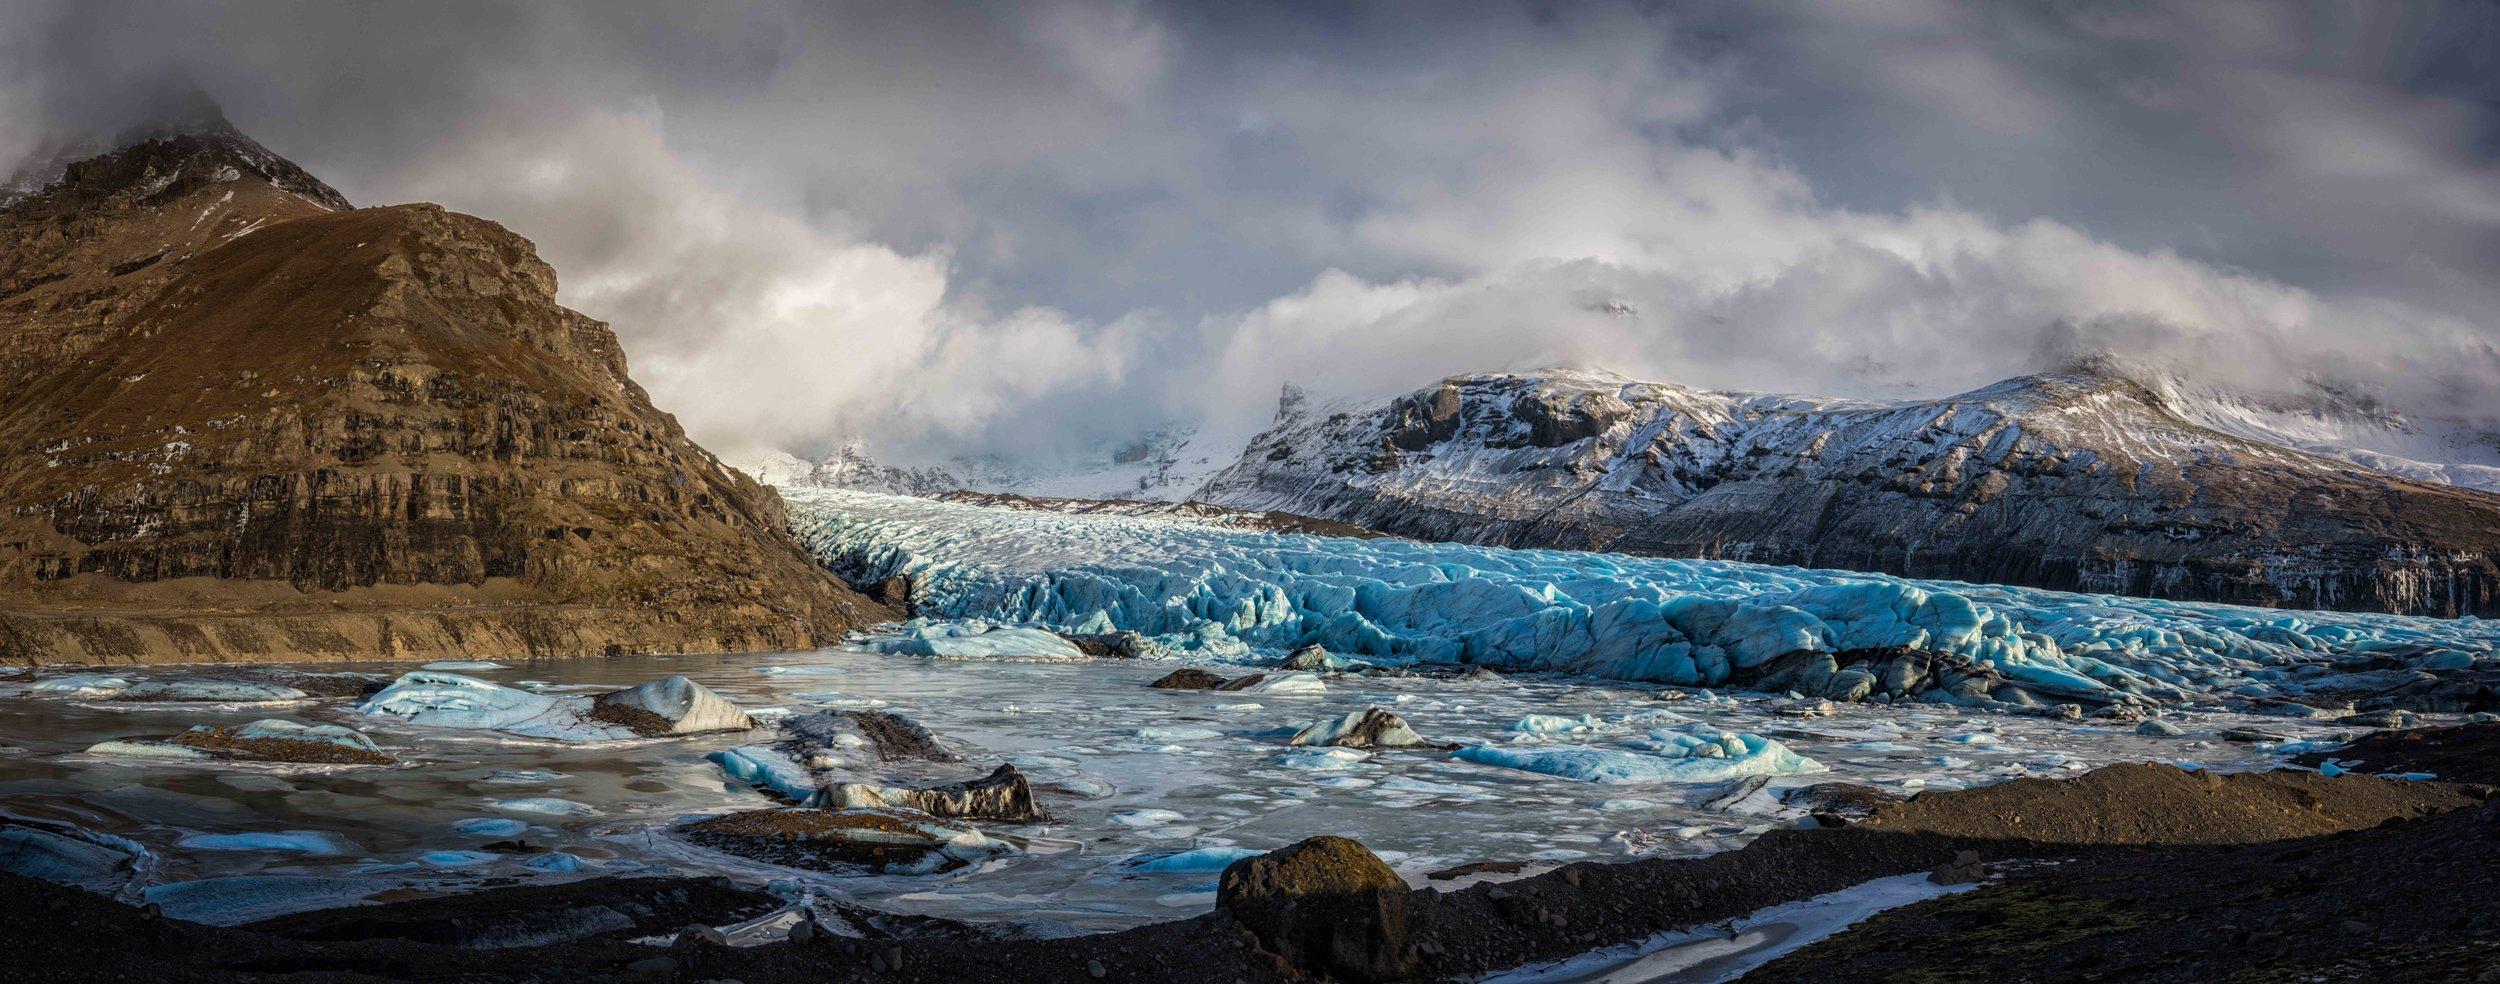 Iceland 2018 - Wednesday day 4--5.jpg